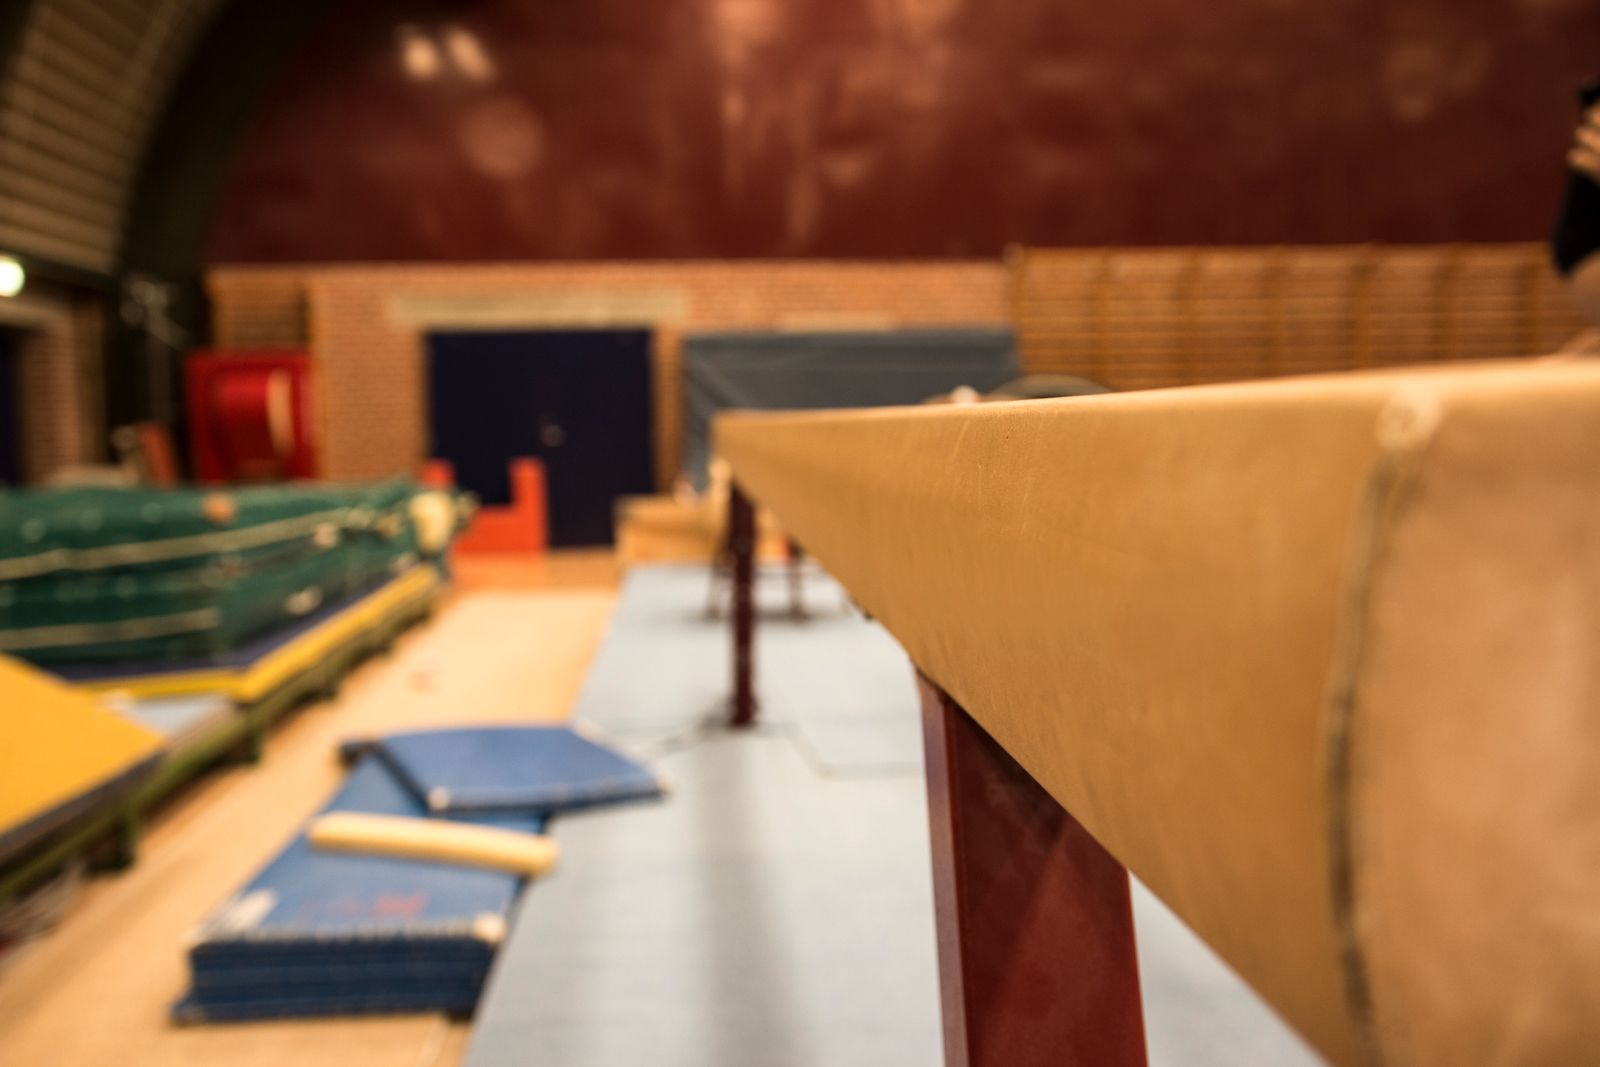 Gymnastics equipment in a gymnastic center